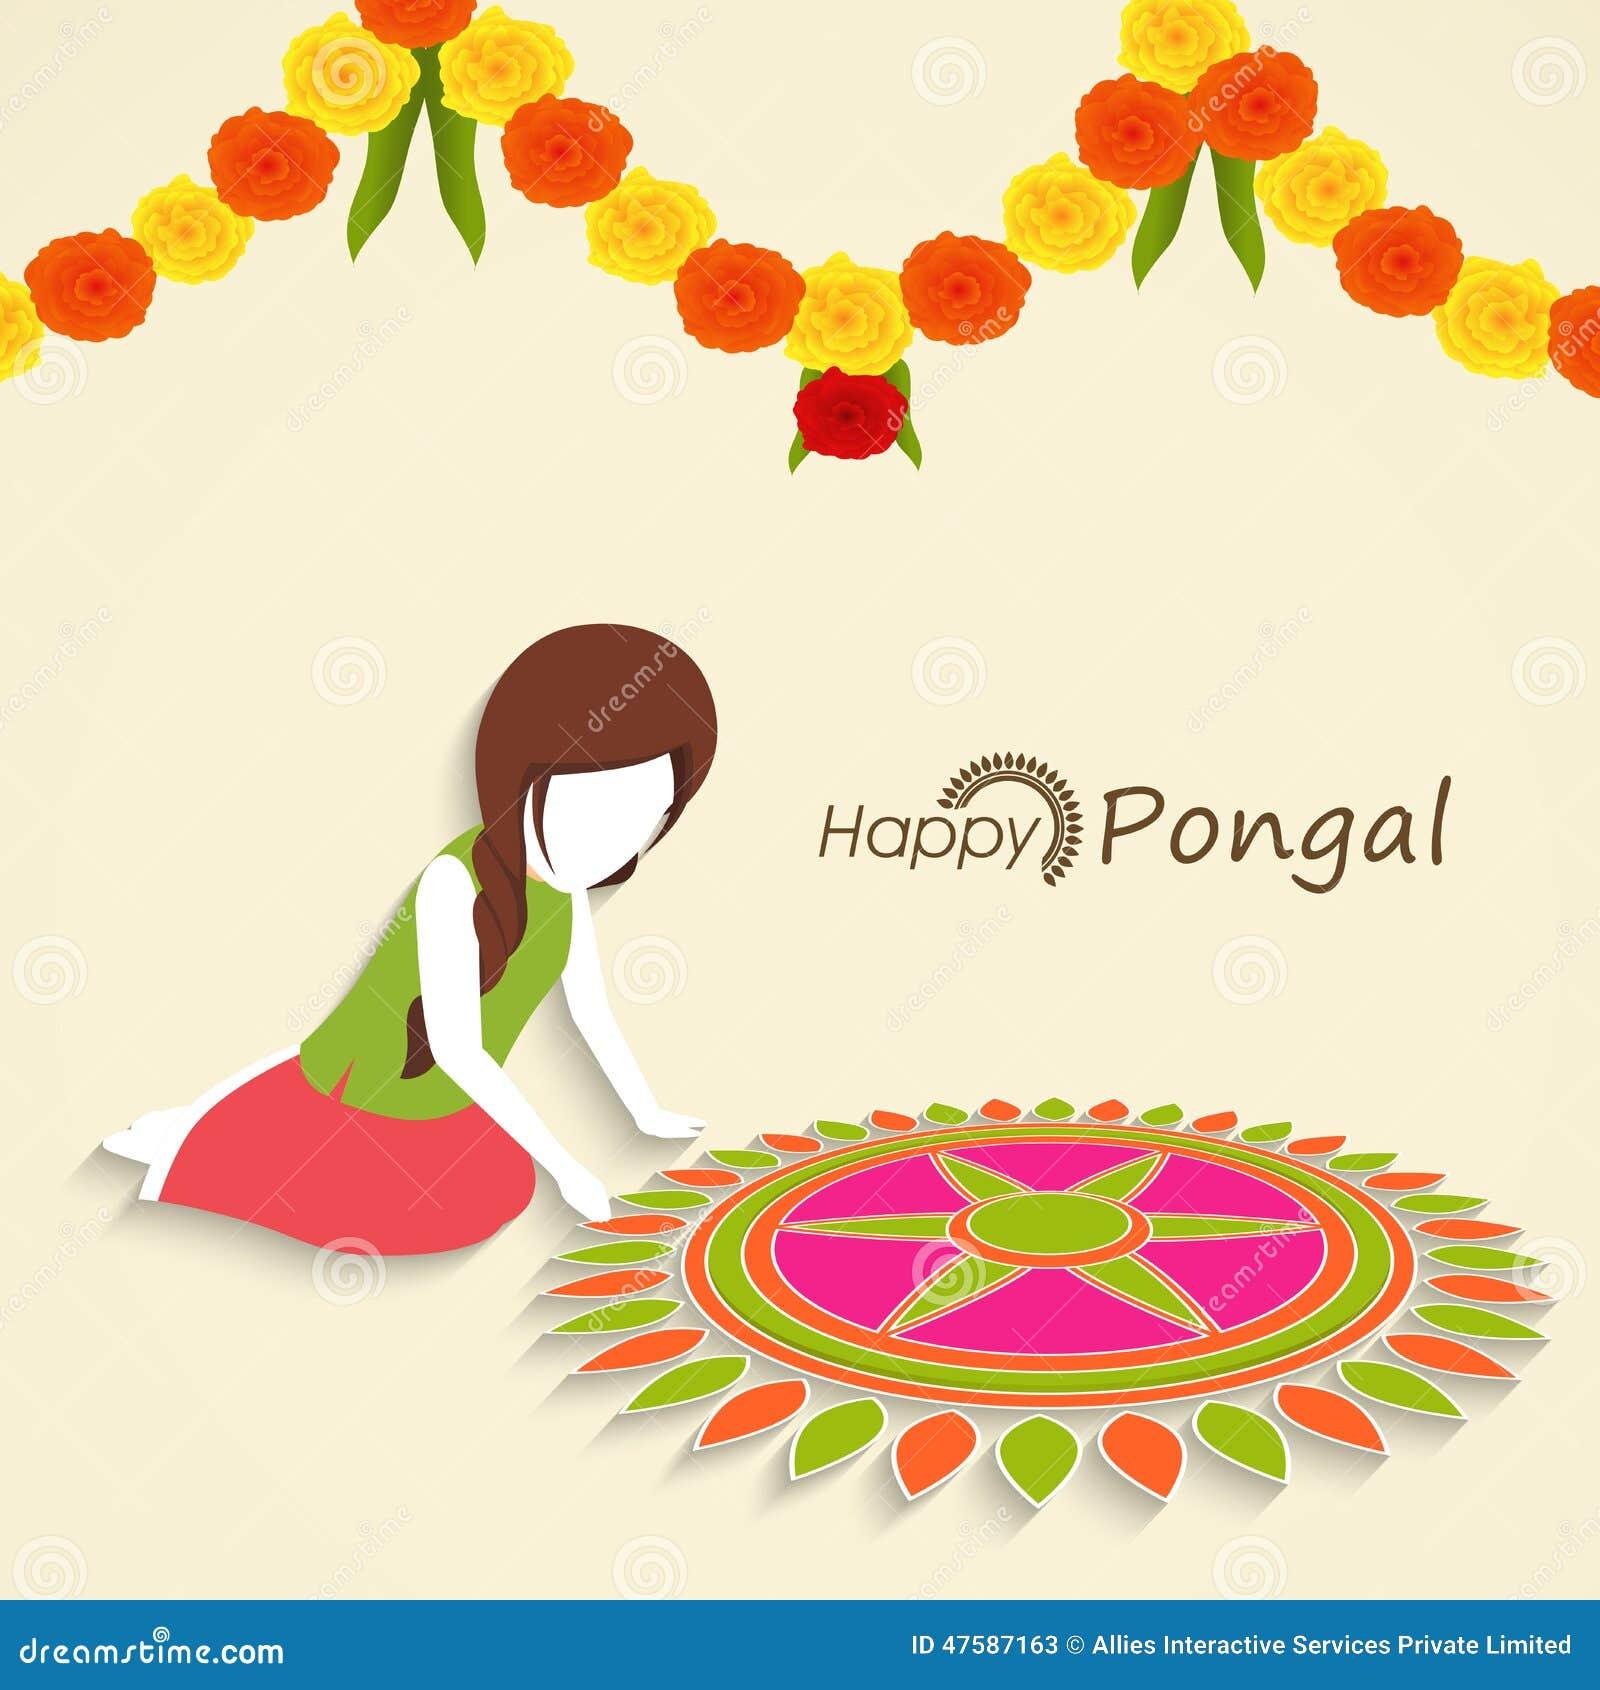 Beautiful Rangoli Decoration For South Indian Festival